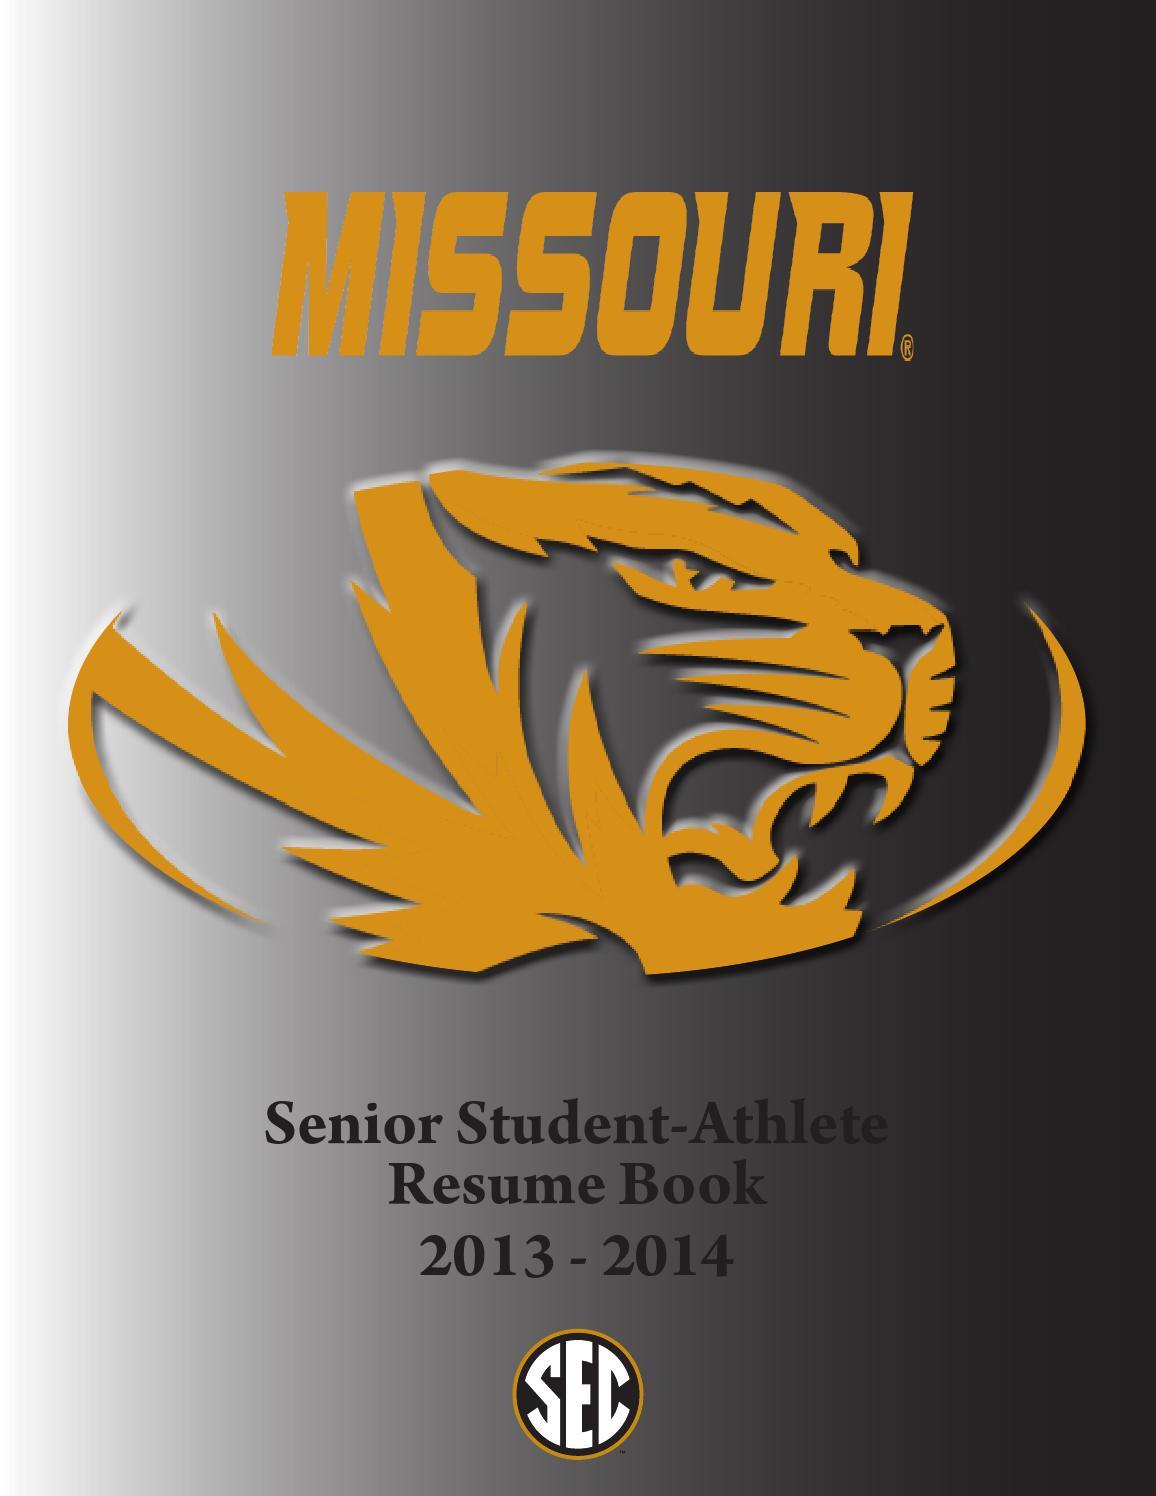 2013 2014 Mizzou Athletics Senior Resume Book By Kim Bishop